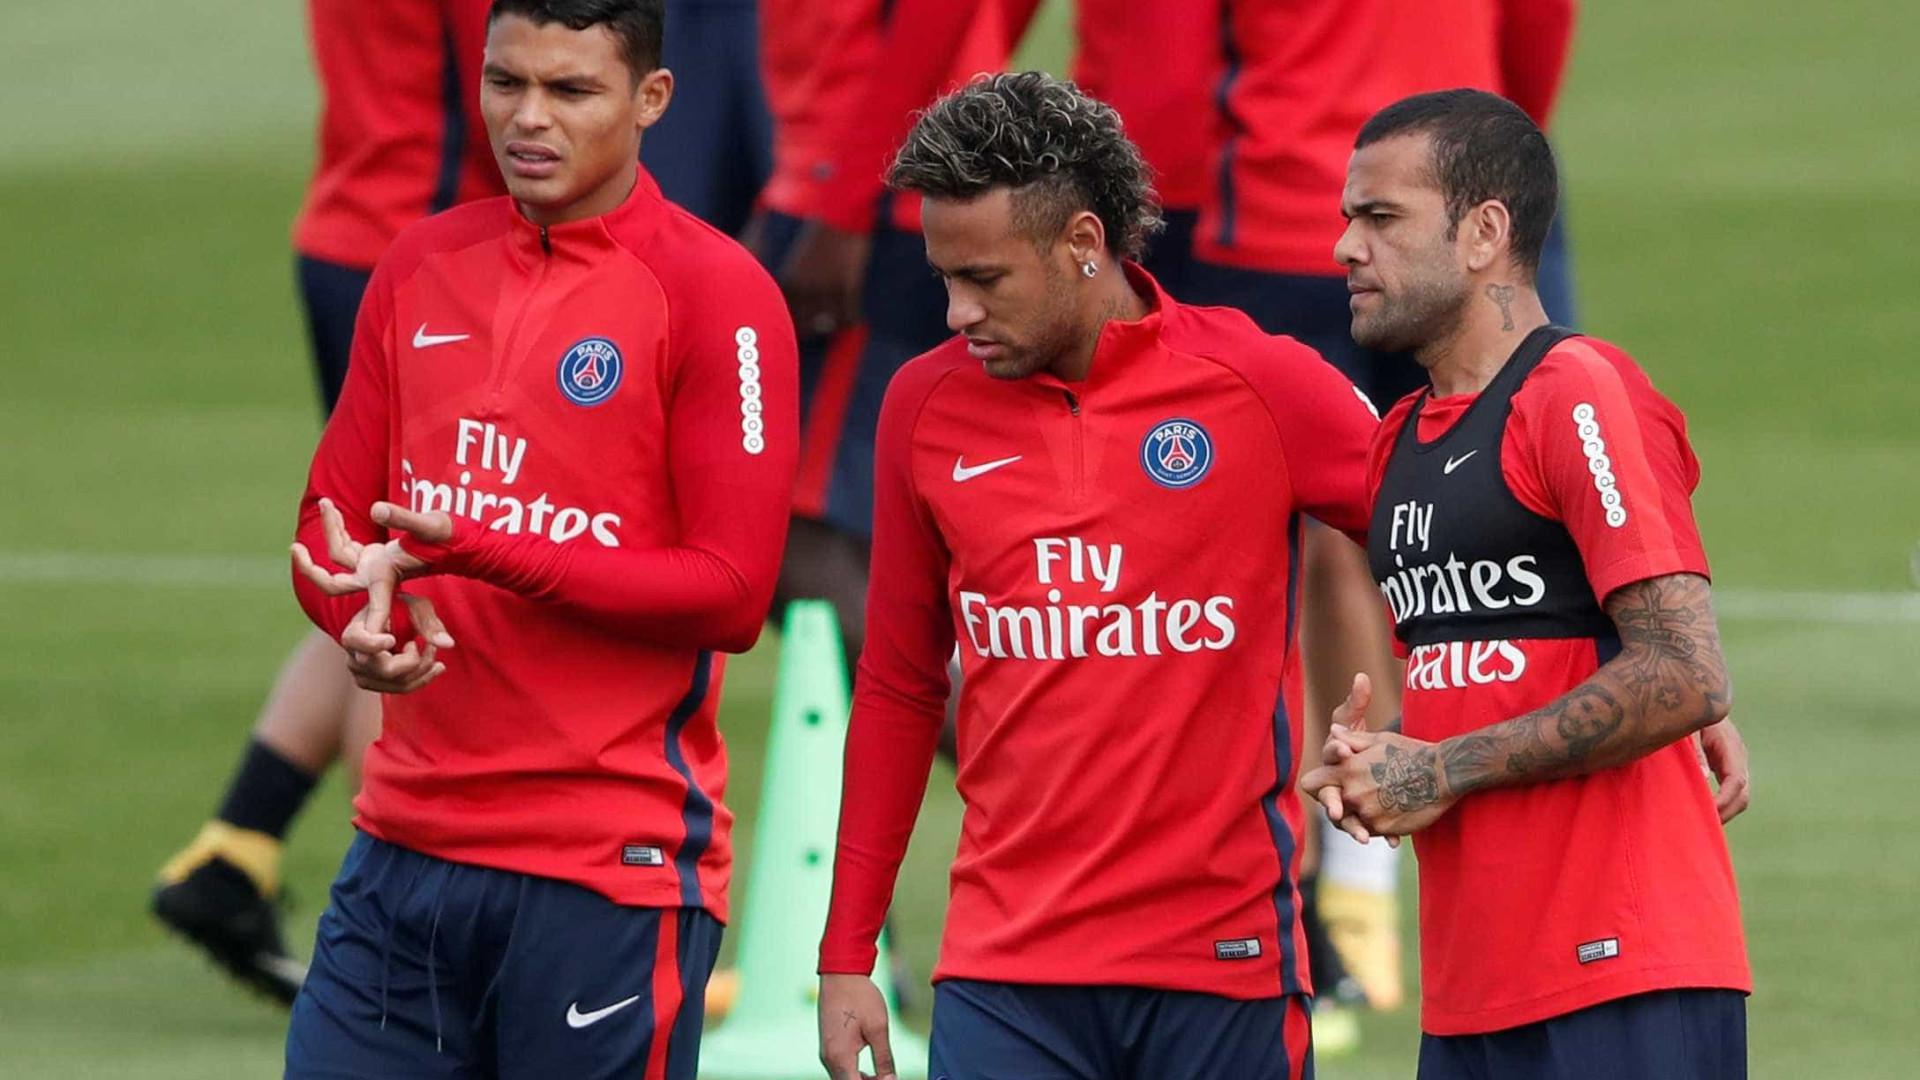 Fifa vai pagar clubes por cada jogador convocado à Copa; saiba o valor